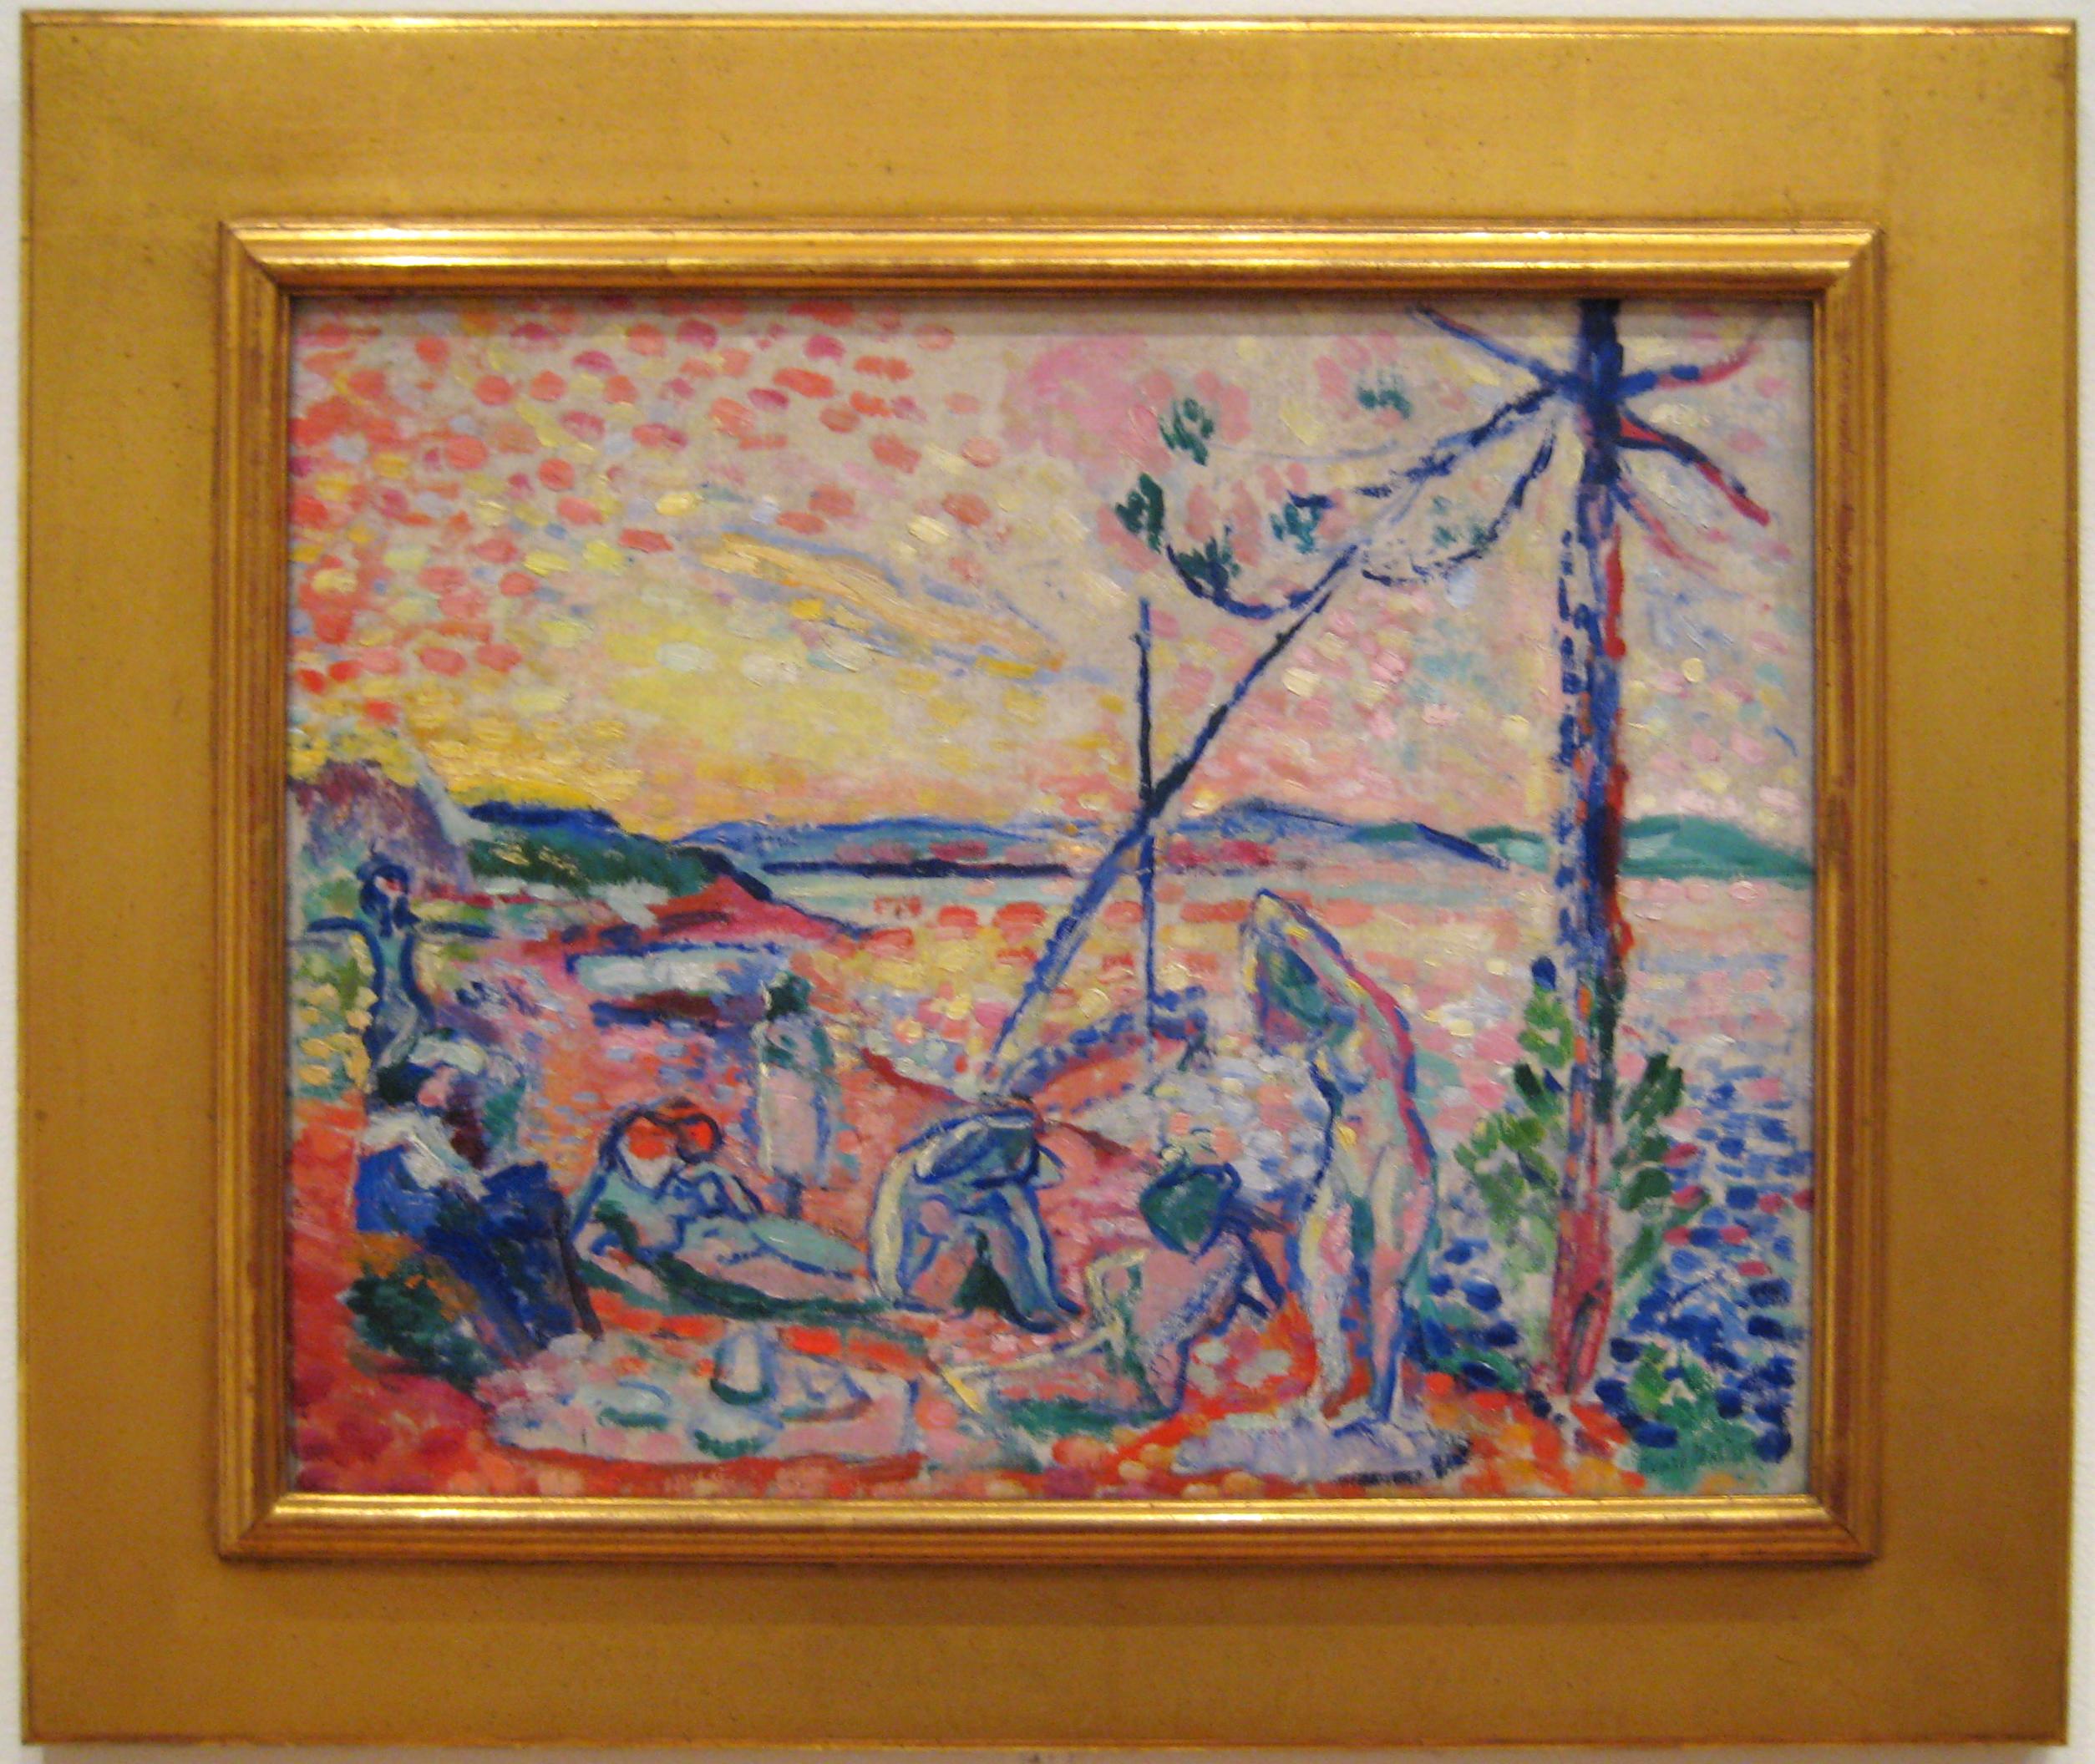 Henri Matisse: Study for Luxe, Calme et Volupté (1904)